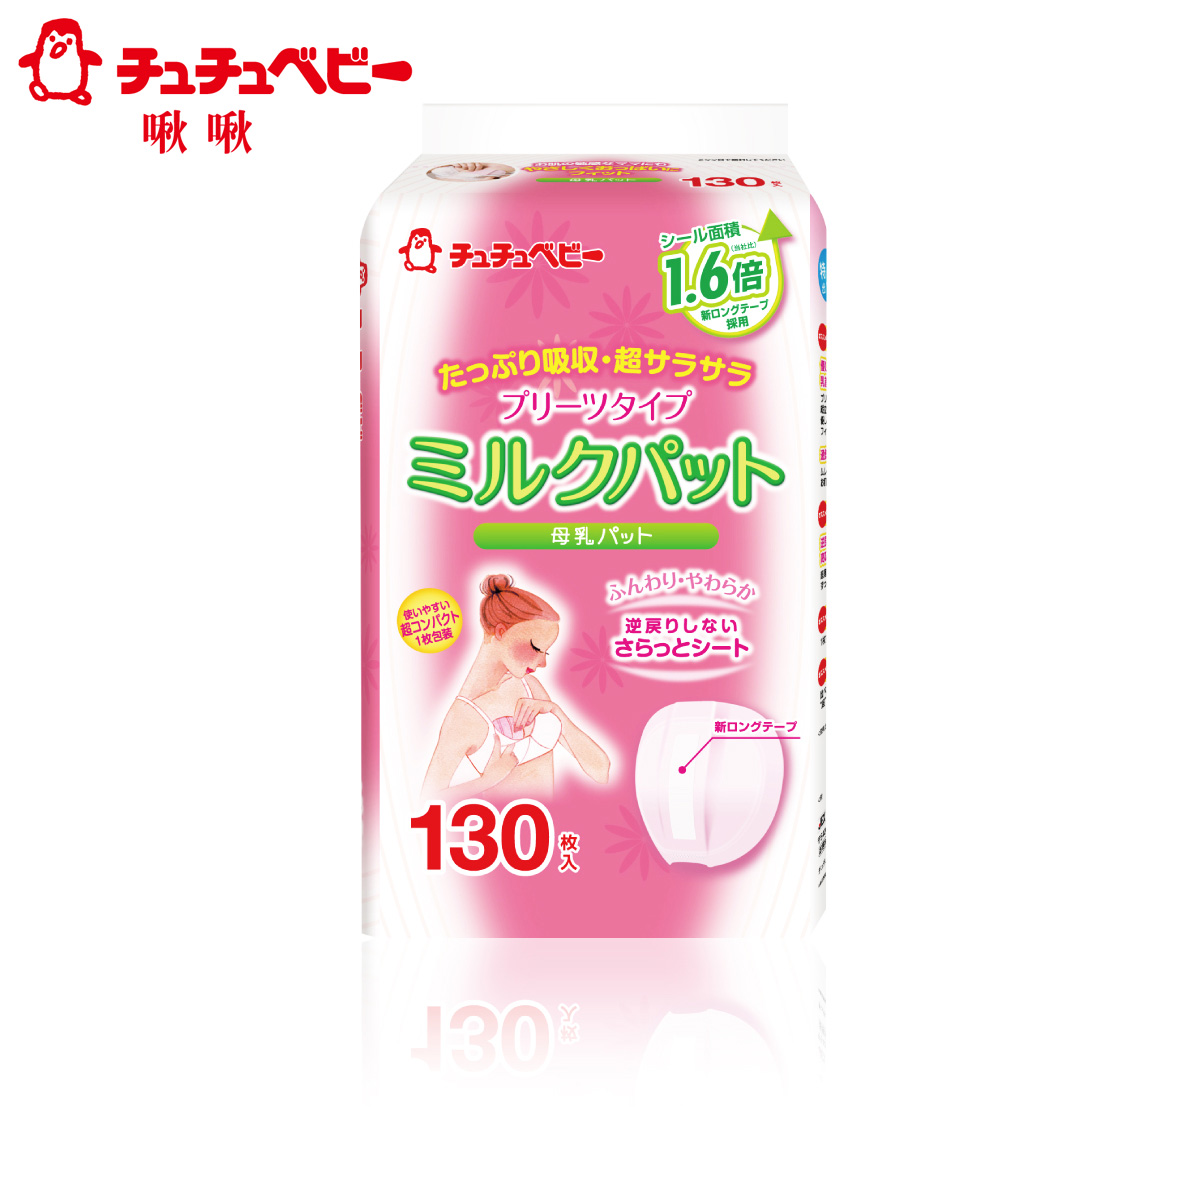 Прокладки для груди Chuchu 1210524 130